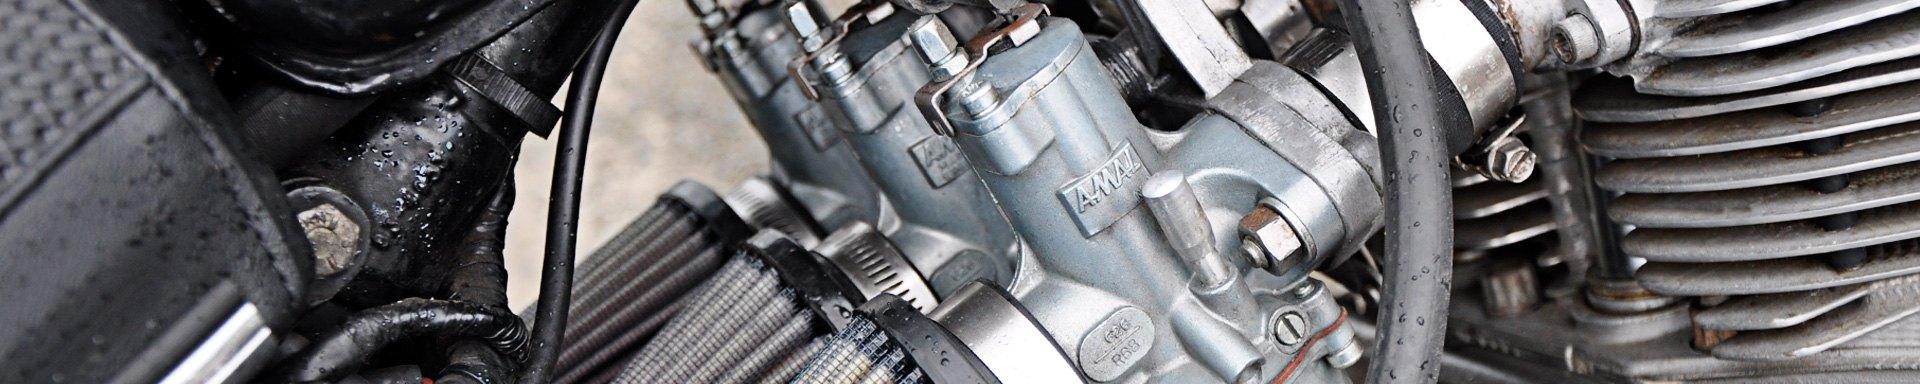 Kawasaki Motorcycle Fuel Parts | Carburetors, Tanks, Filters